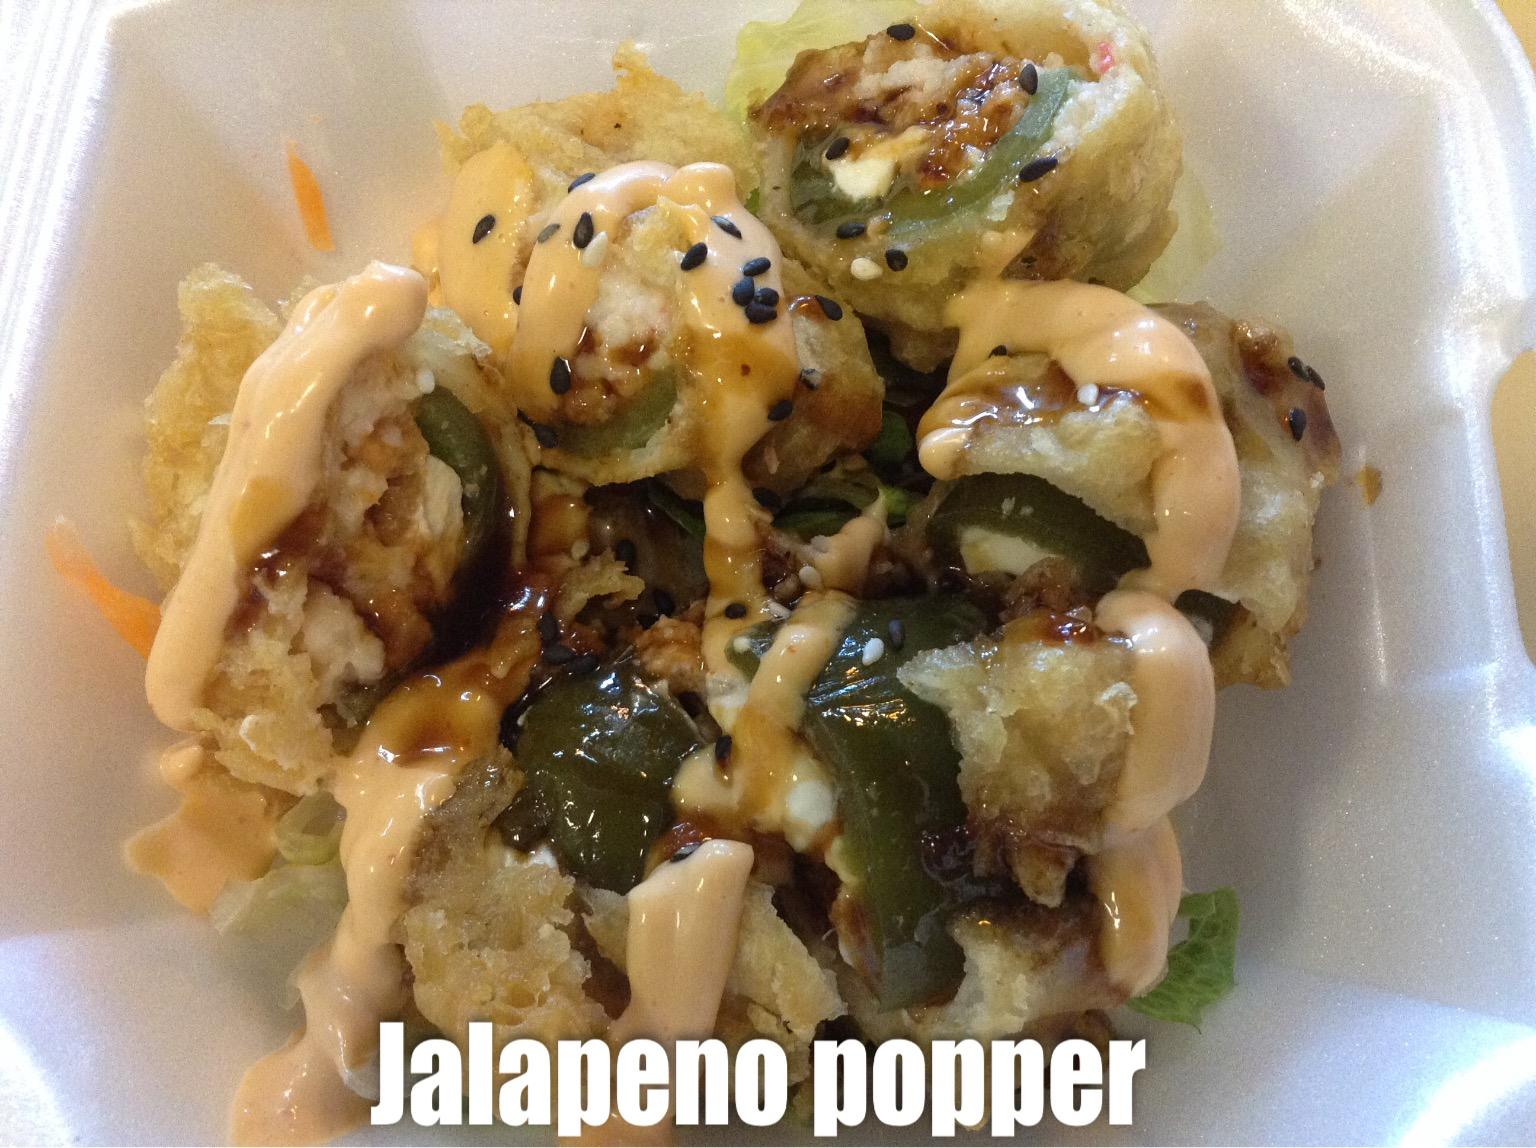 Jalapeno Popper (4) Image